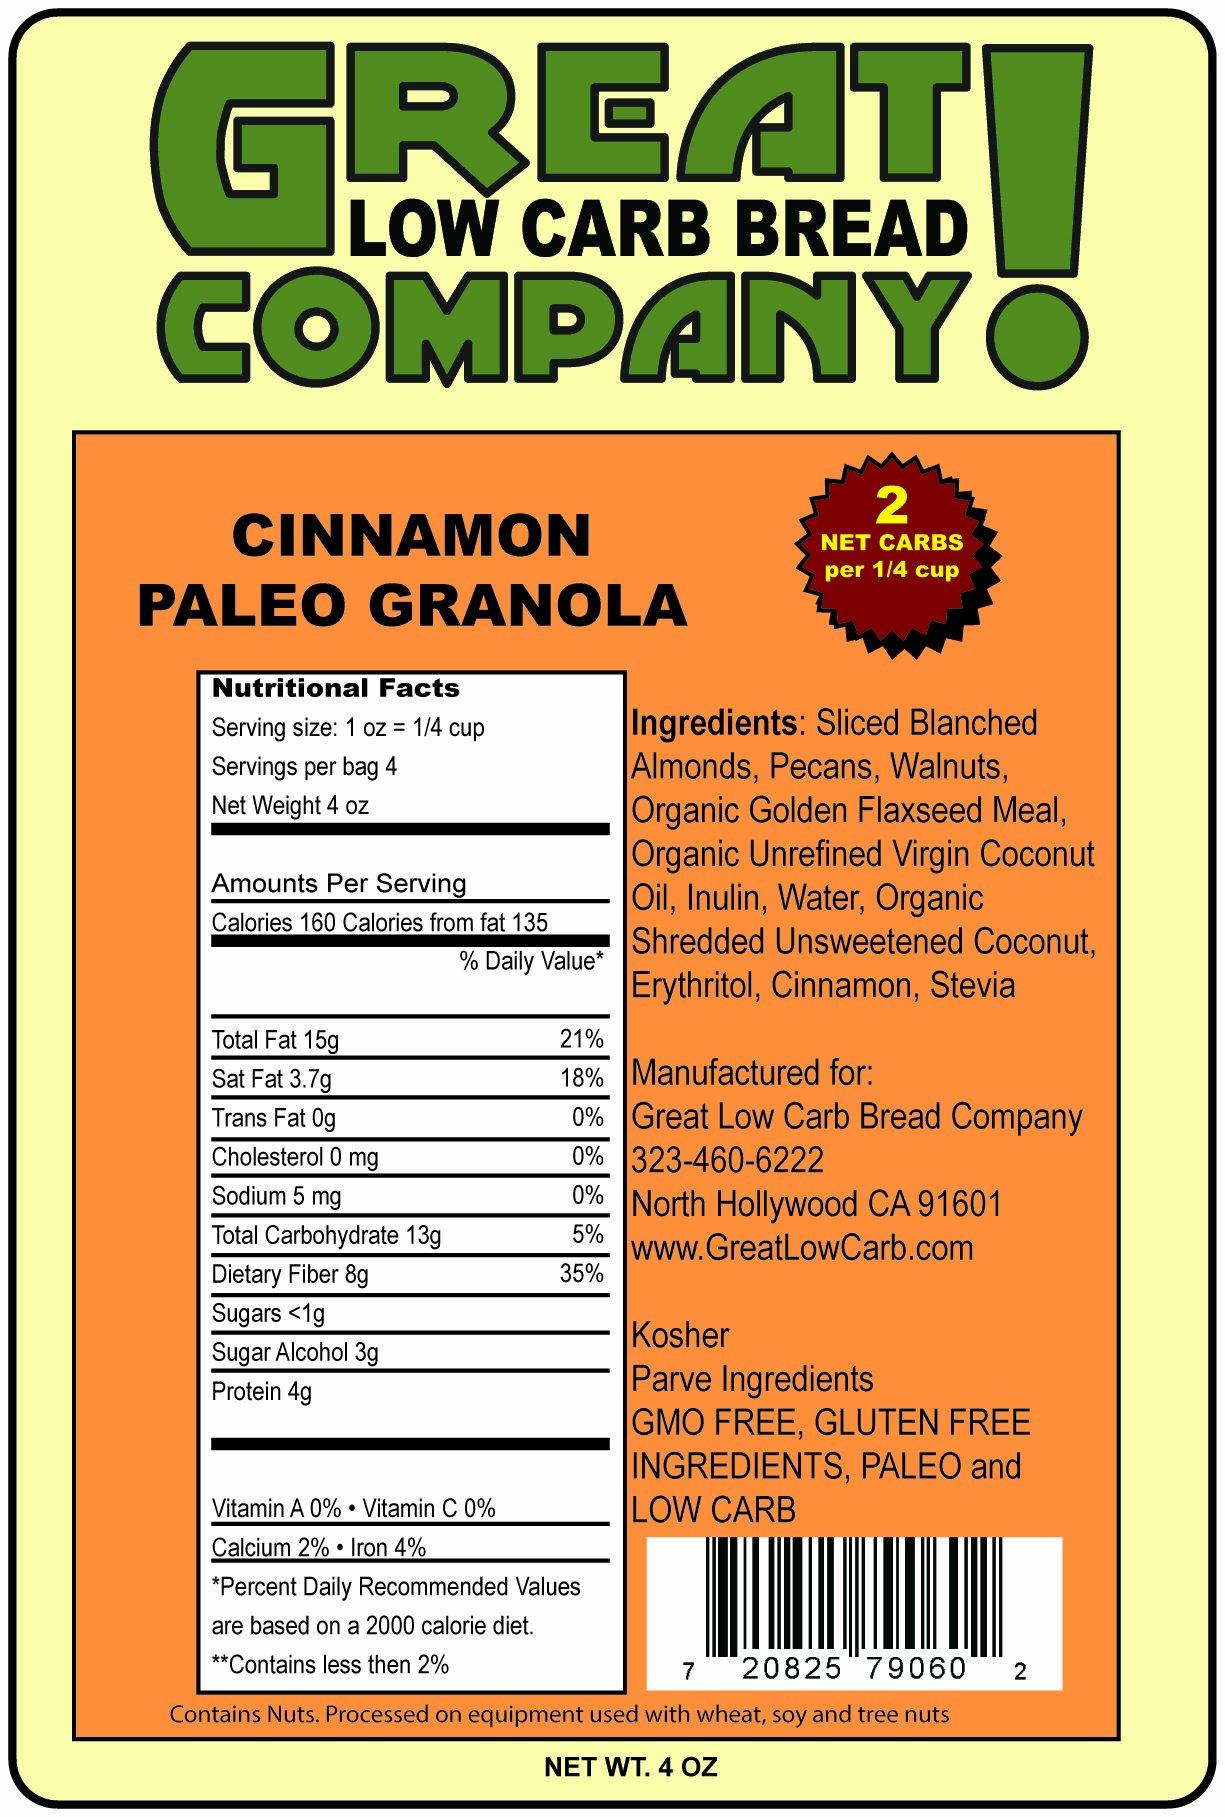 Great Low Carb Paleo Granola Cinnamon Flavor 3- 4oz Bags